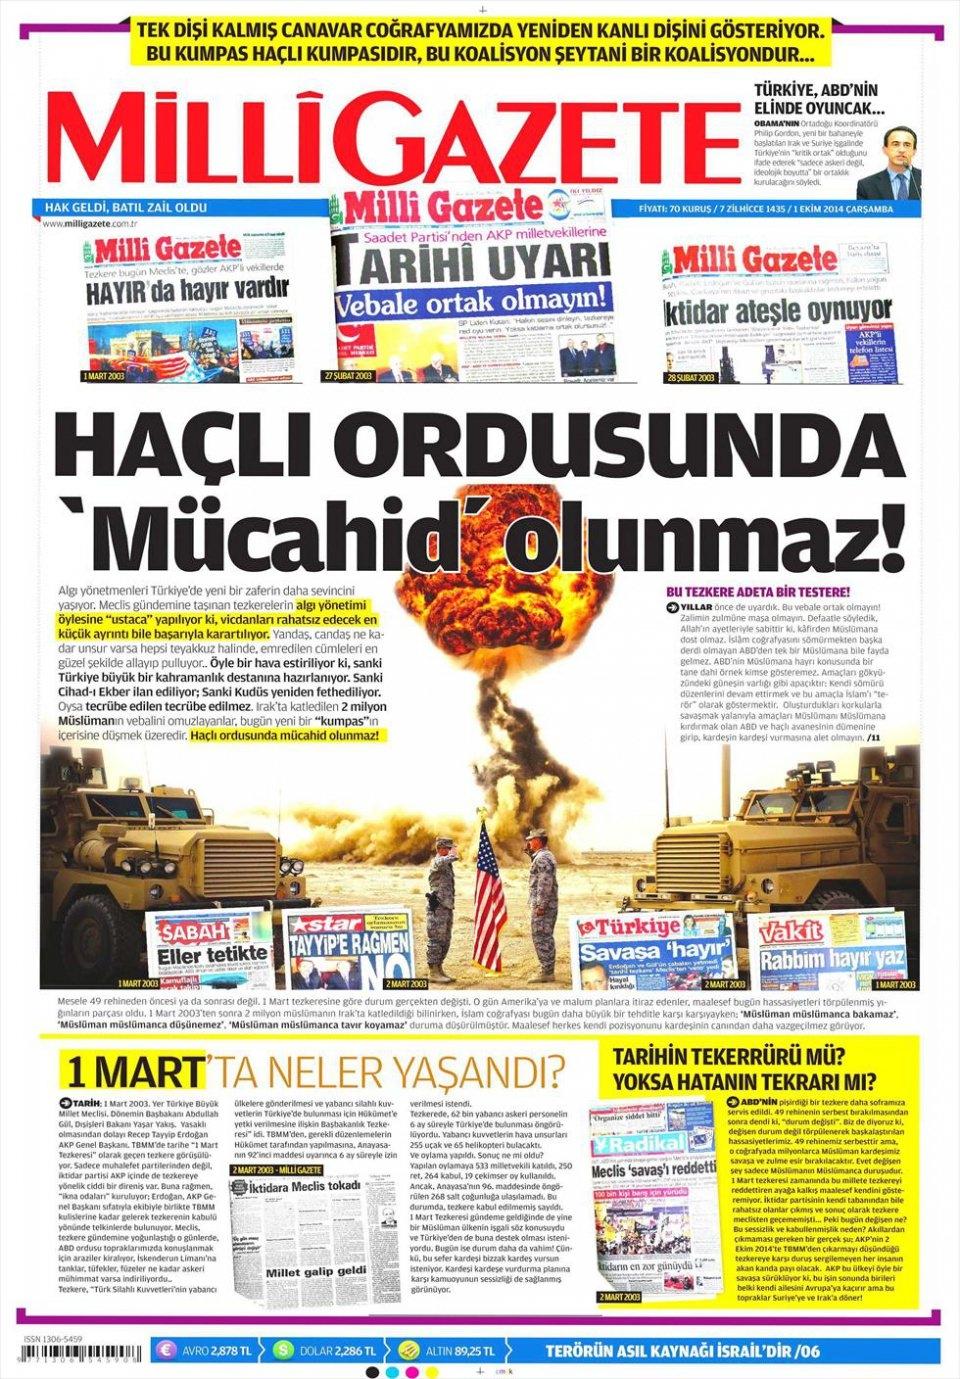 1 Ekim 2014 gazete manşetleri 11